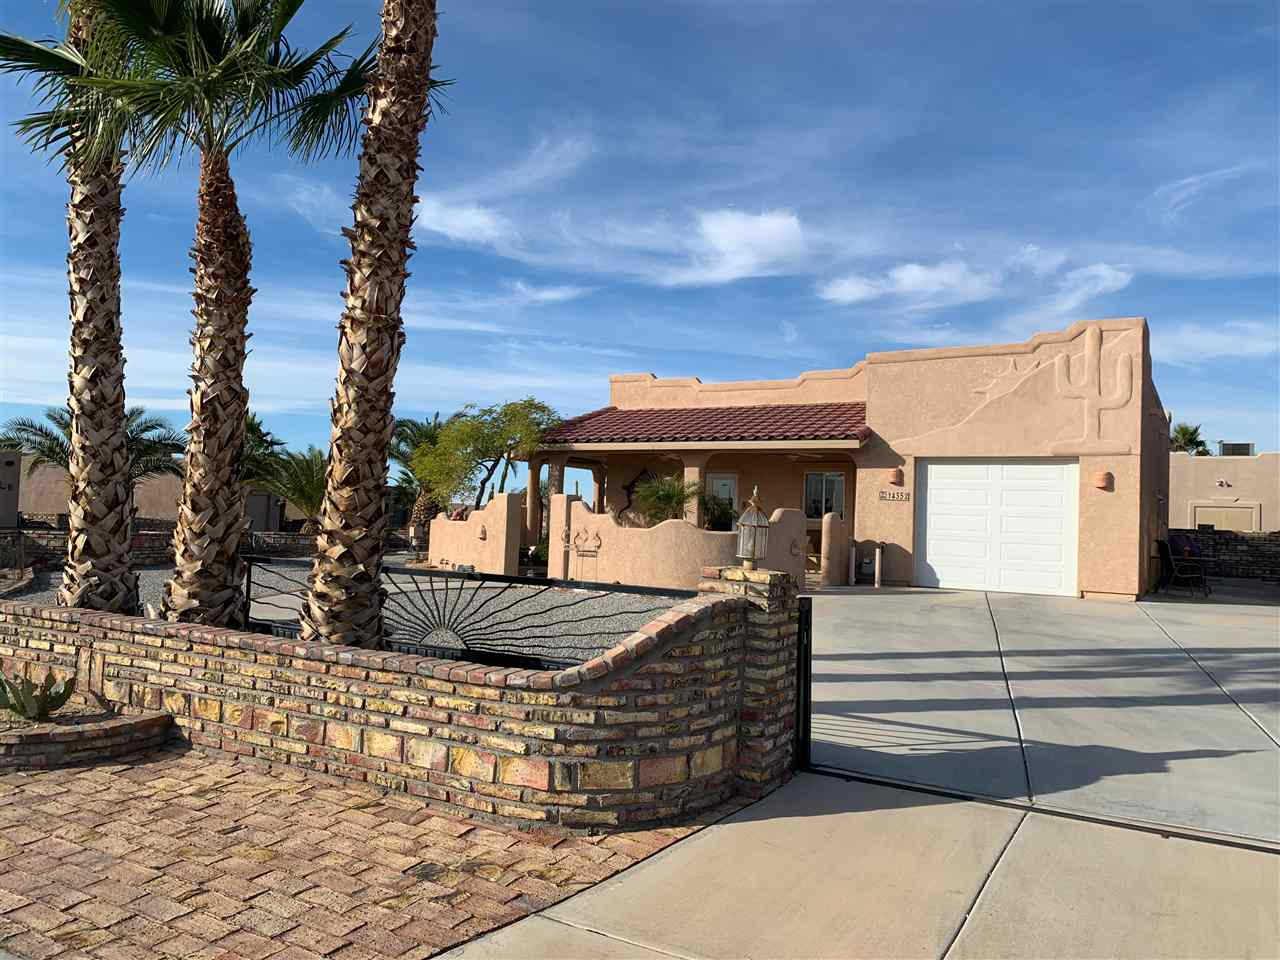 14352 E 53 Ln, Yuma, AZ 85367 has an Open House on  Friday, February 21, 2020 10:00 AM to 2:00 PM